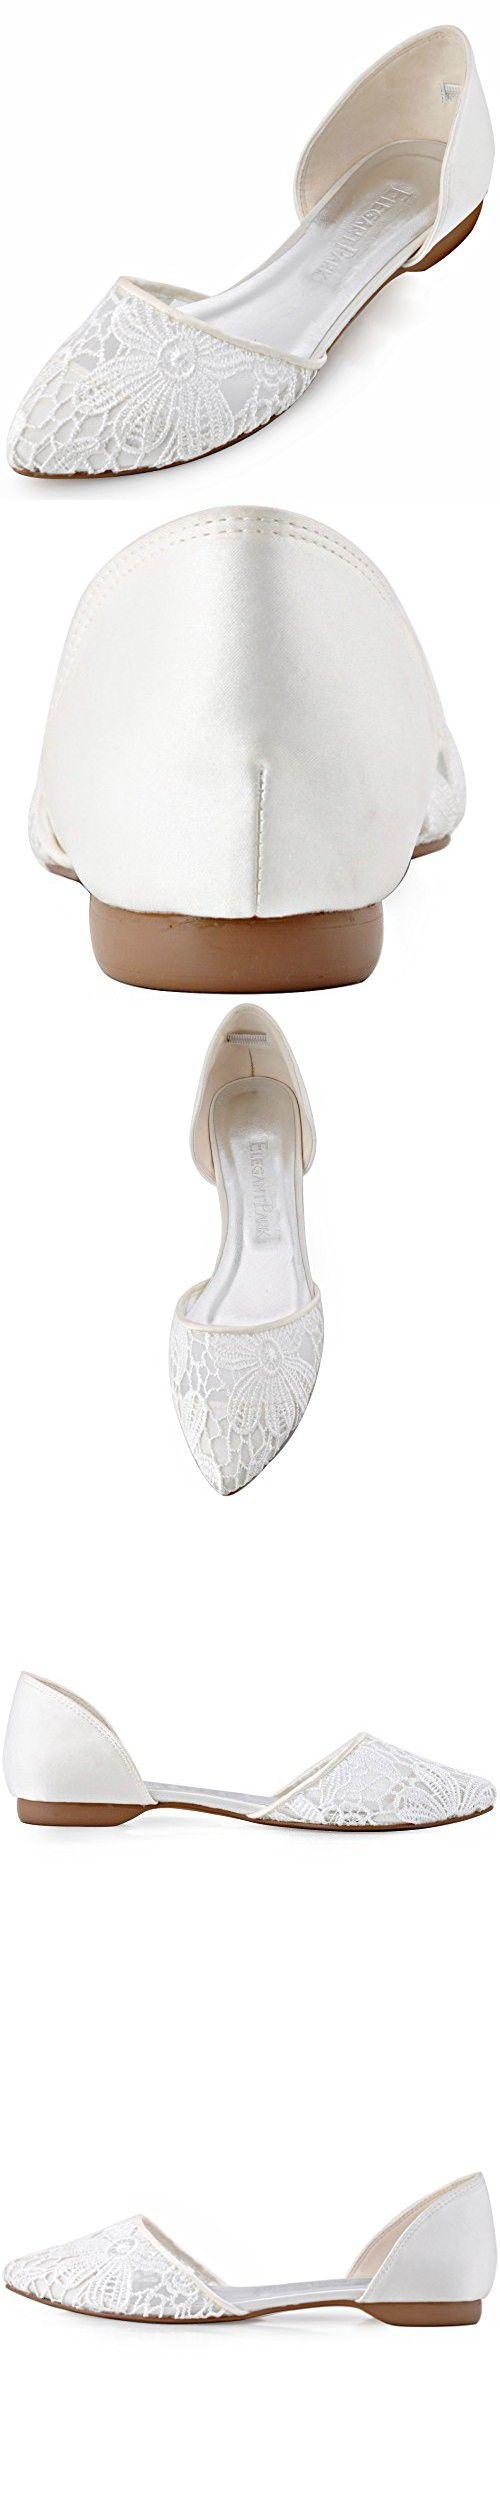 ElegantPark FC1527 Women Pointed Toe Comfort Low Heel Vintage Lace Wedding Flats Ivory US 10